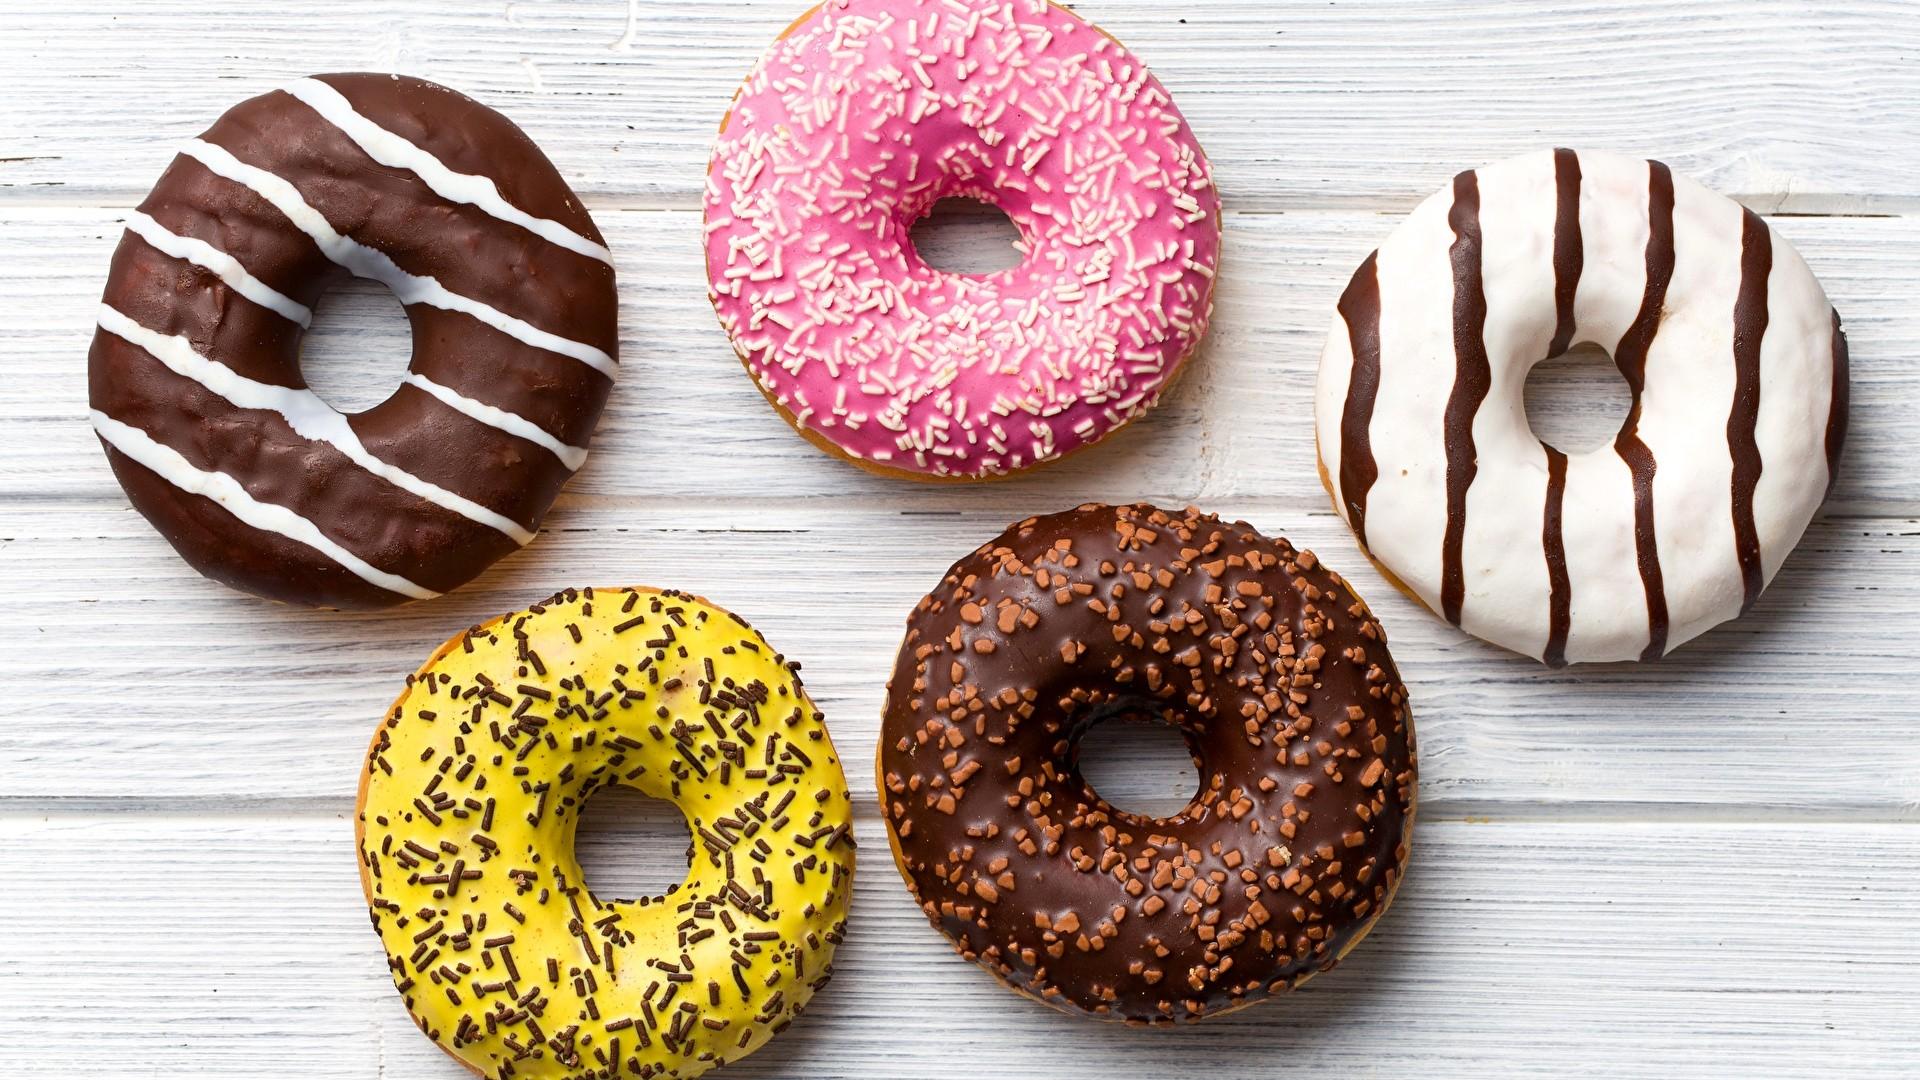 Donut hd wallpaper download